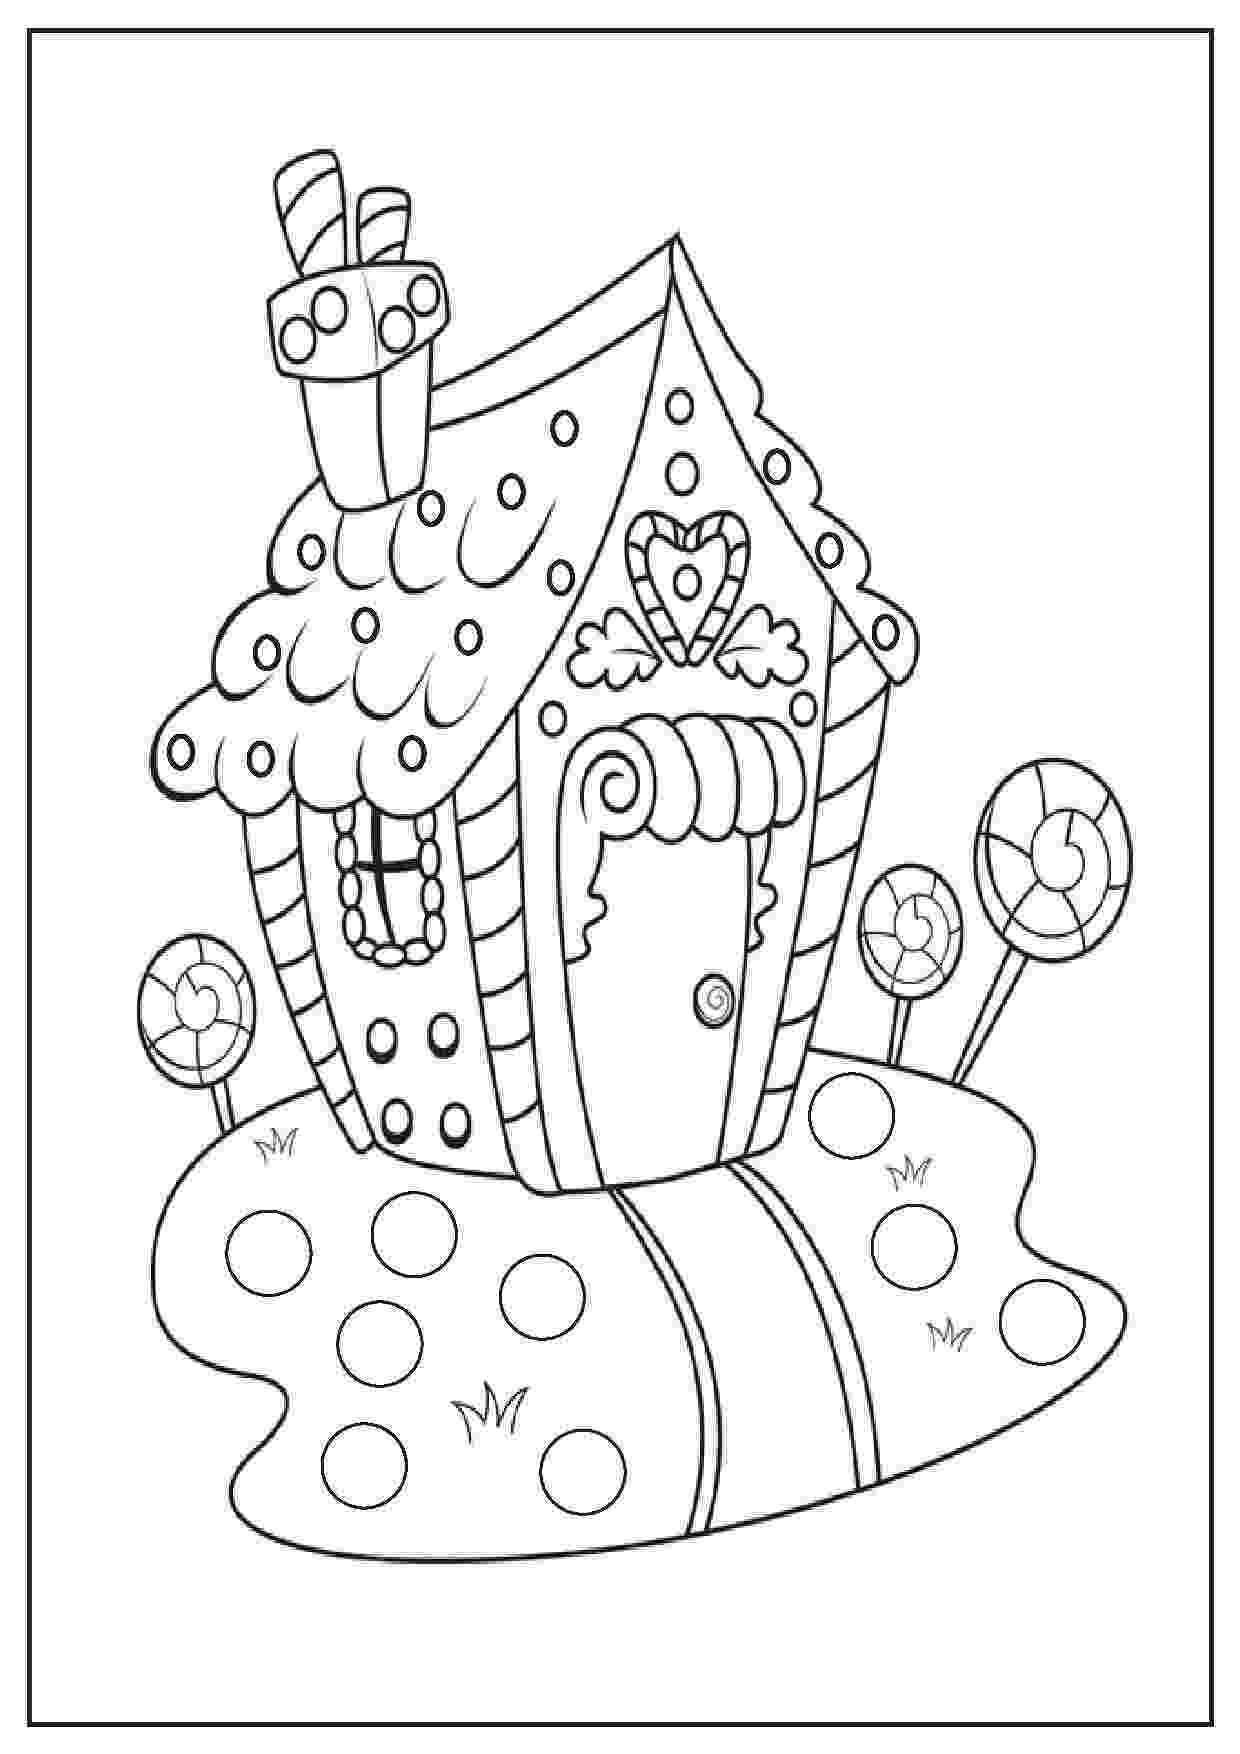 printable christmas coloring pages for kindergarten christmas bear worksheet educationcom for pages printable kindergarten christmas coloring